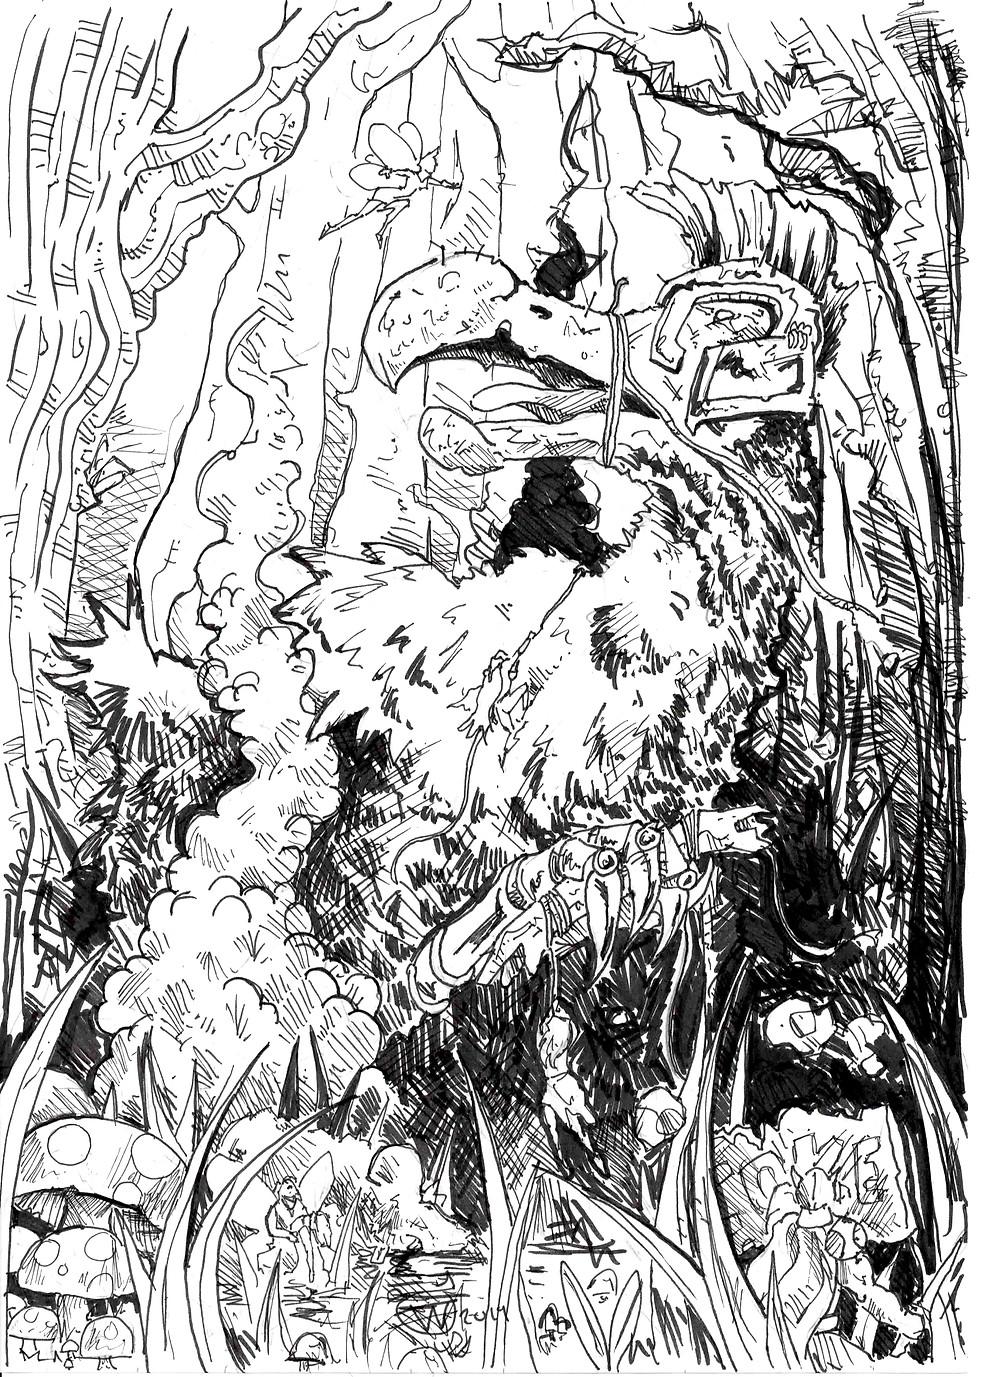 an ink drawing of dodos and fairies at war